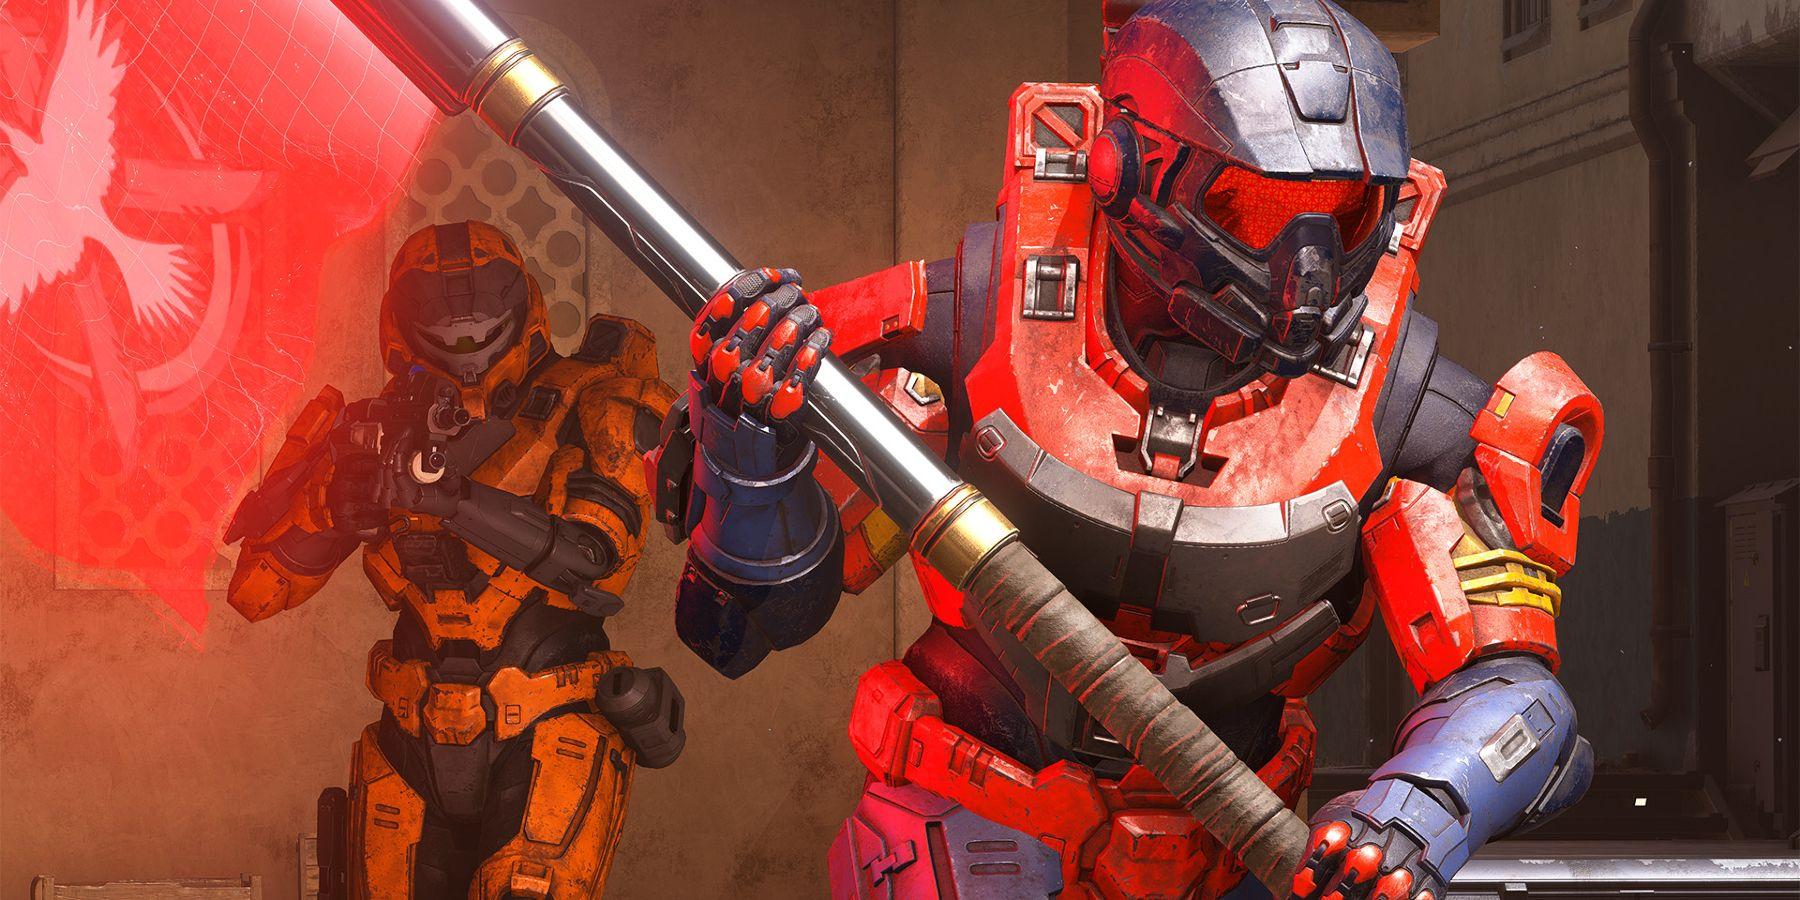 Halo Infinite is Bringing Back the Old-School Radar